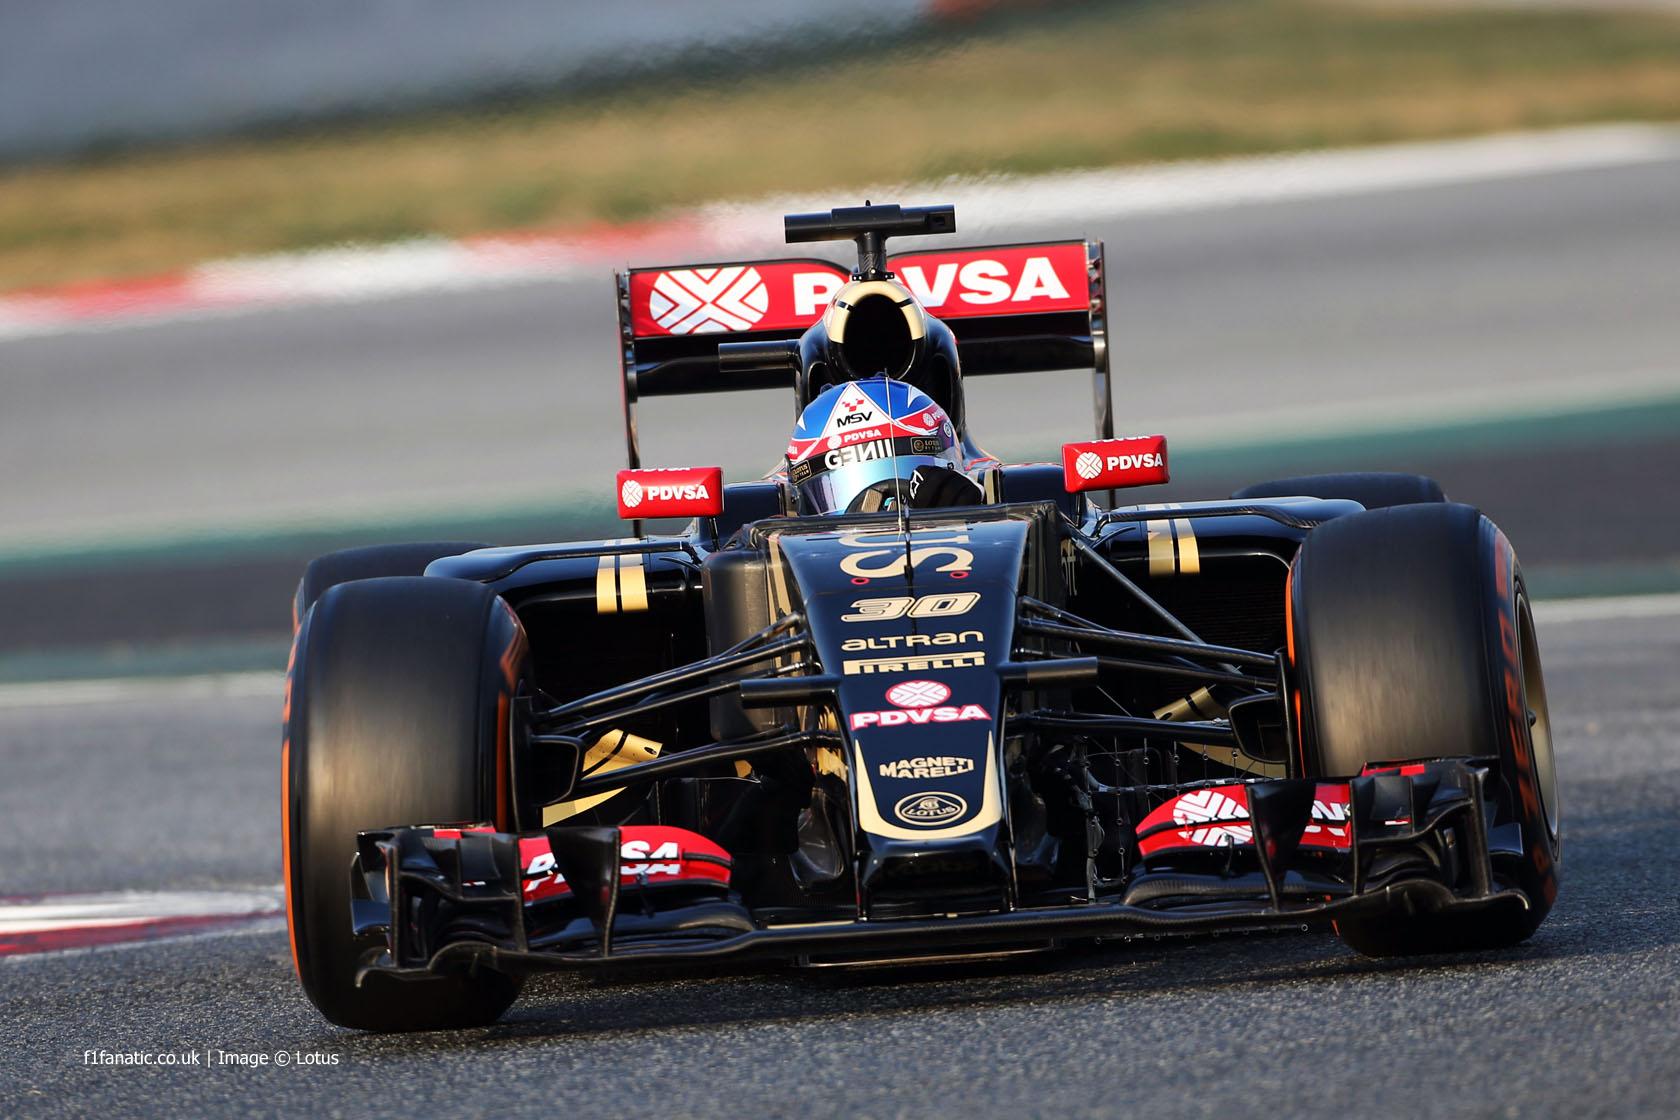 Jolyon-Palmer-Lotus-2015-F1-testing-Barcelona-1